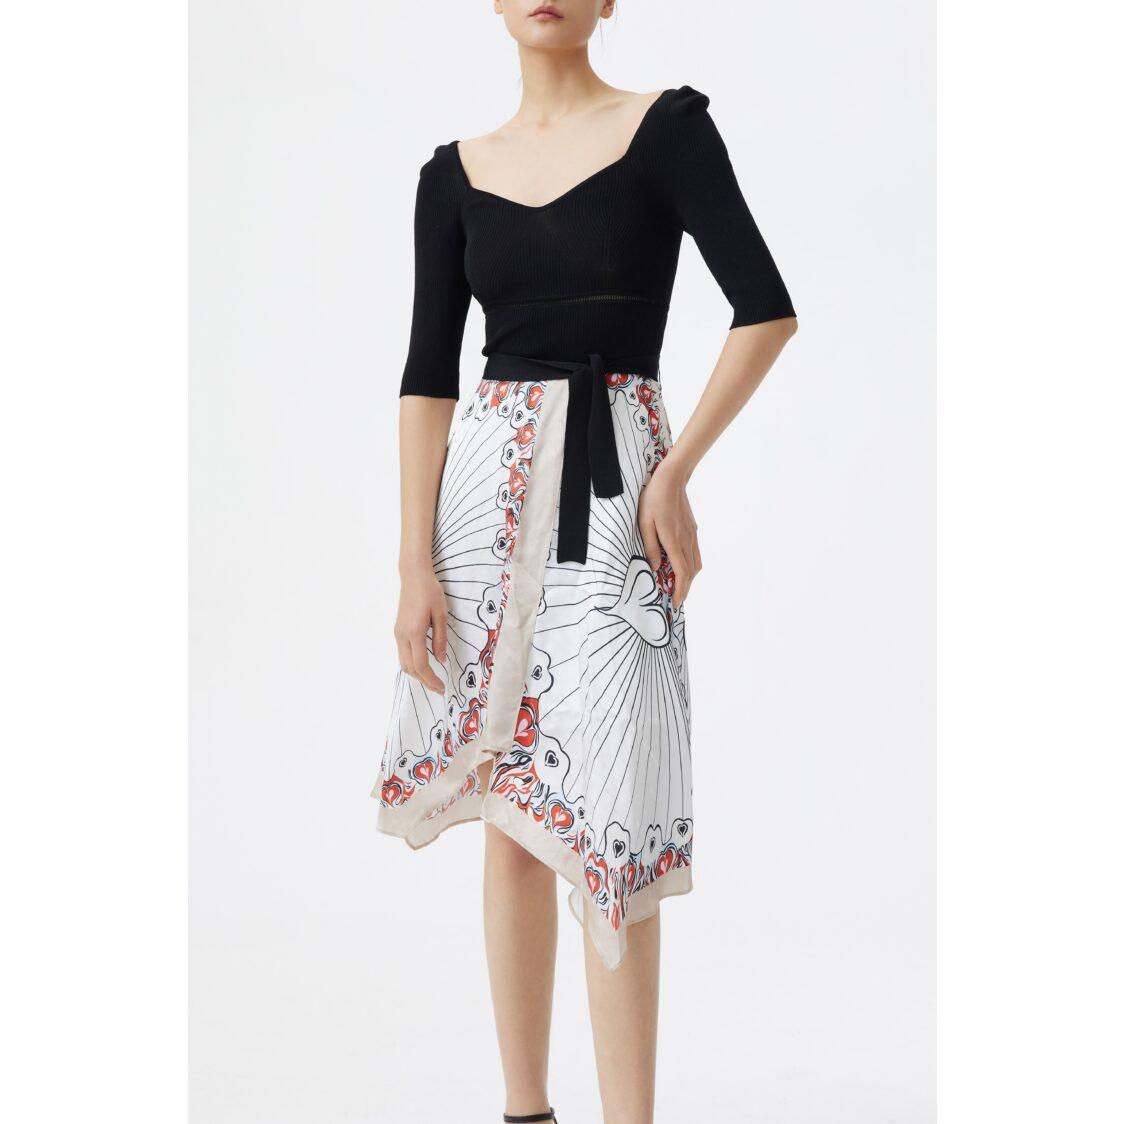 Lily Irregular Patchwork Dress Black